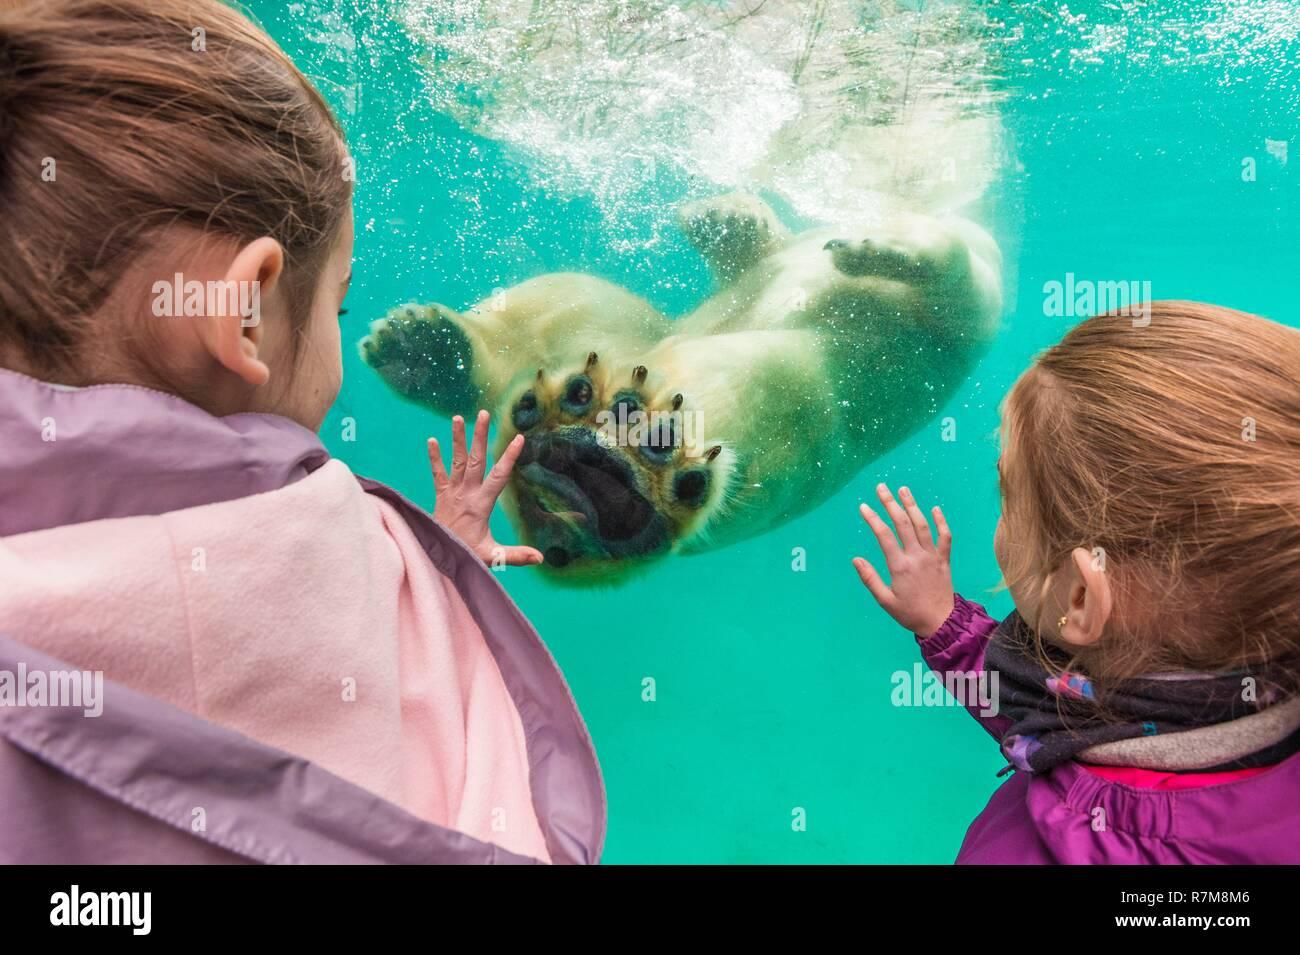 France, Sarthe, La Fleche, La Fleche Zoo, family observation of Taïko, male polar bear (Ursus maritimus) swimming in its basinotection status, Washington Convention Appendix II B (CITES), IUCN status, Minimum risk, dependent on conservation measures (LR-cd) - Stock Image